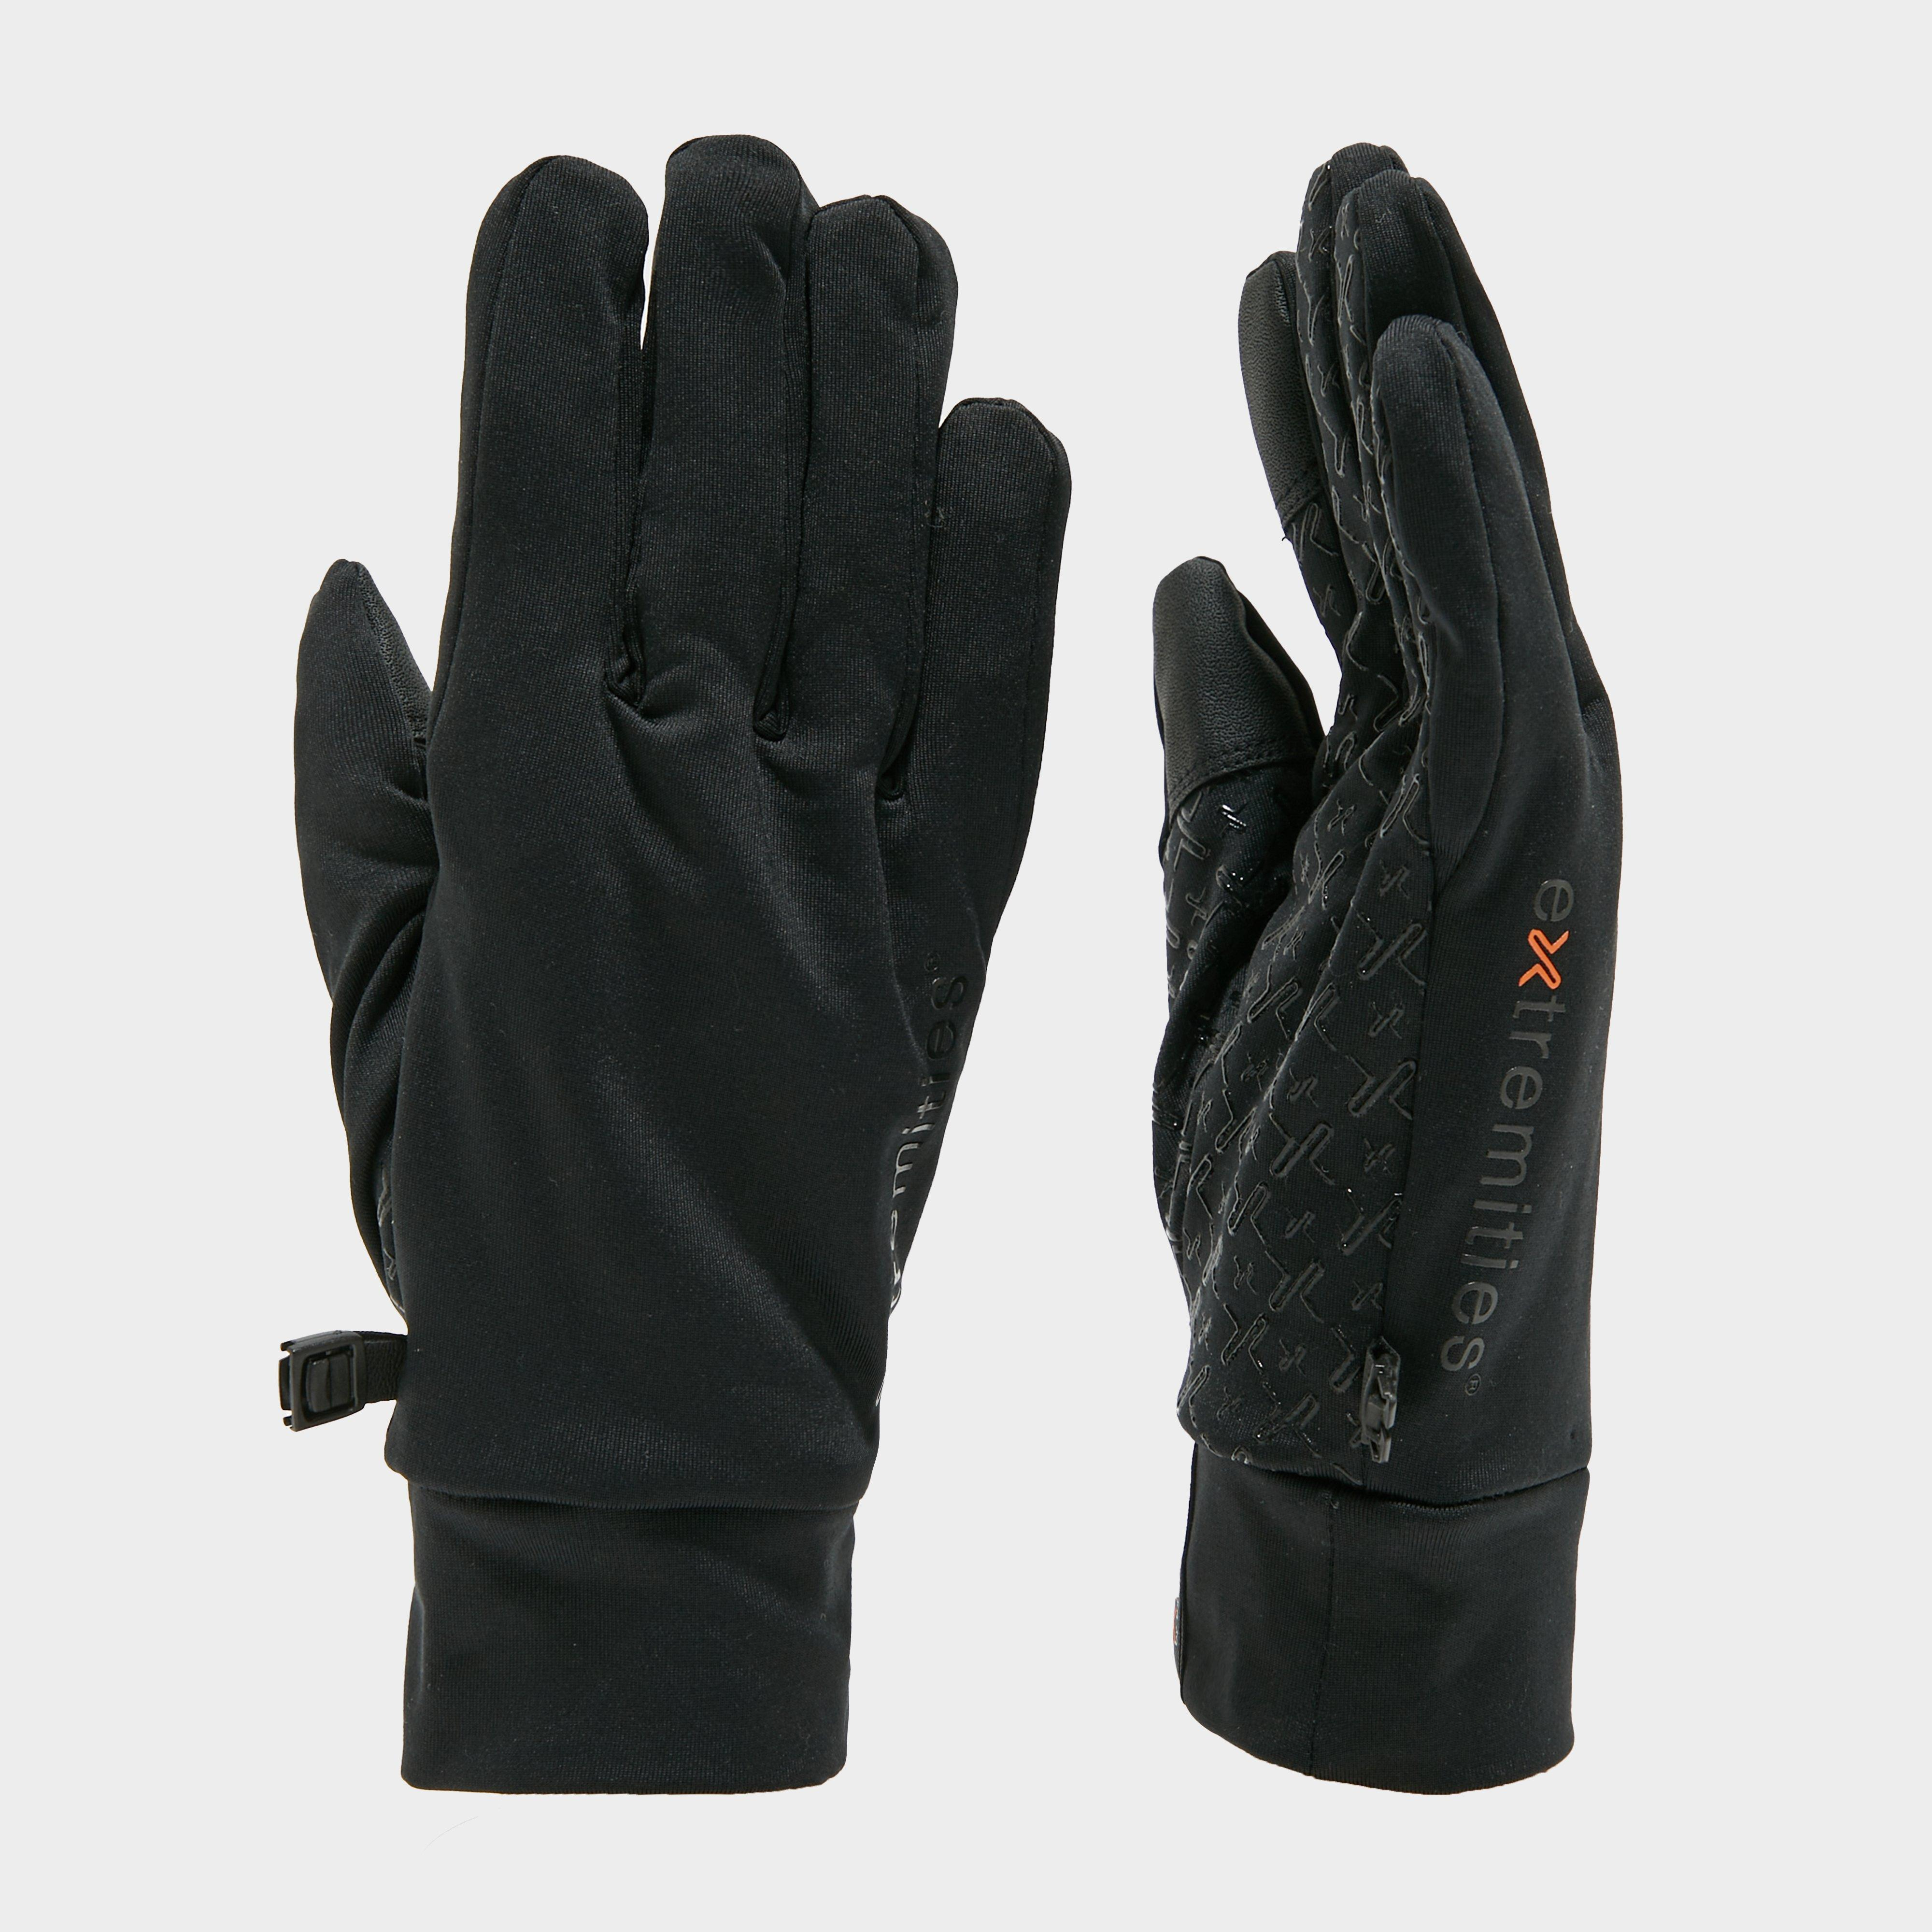 Extremities Waterproof Sticky Power Liner Glove - Black/blk  Black/blk